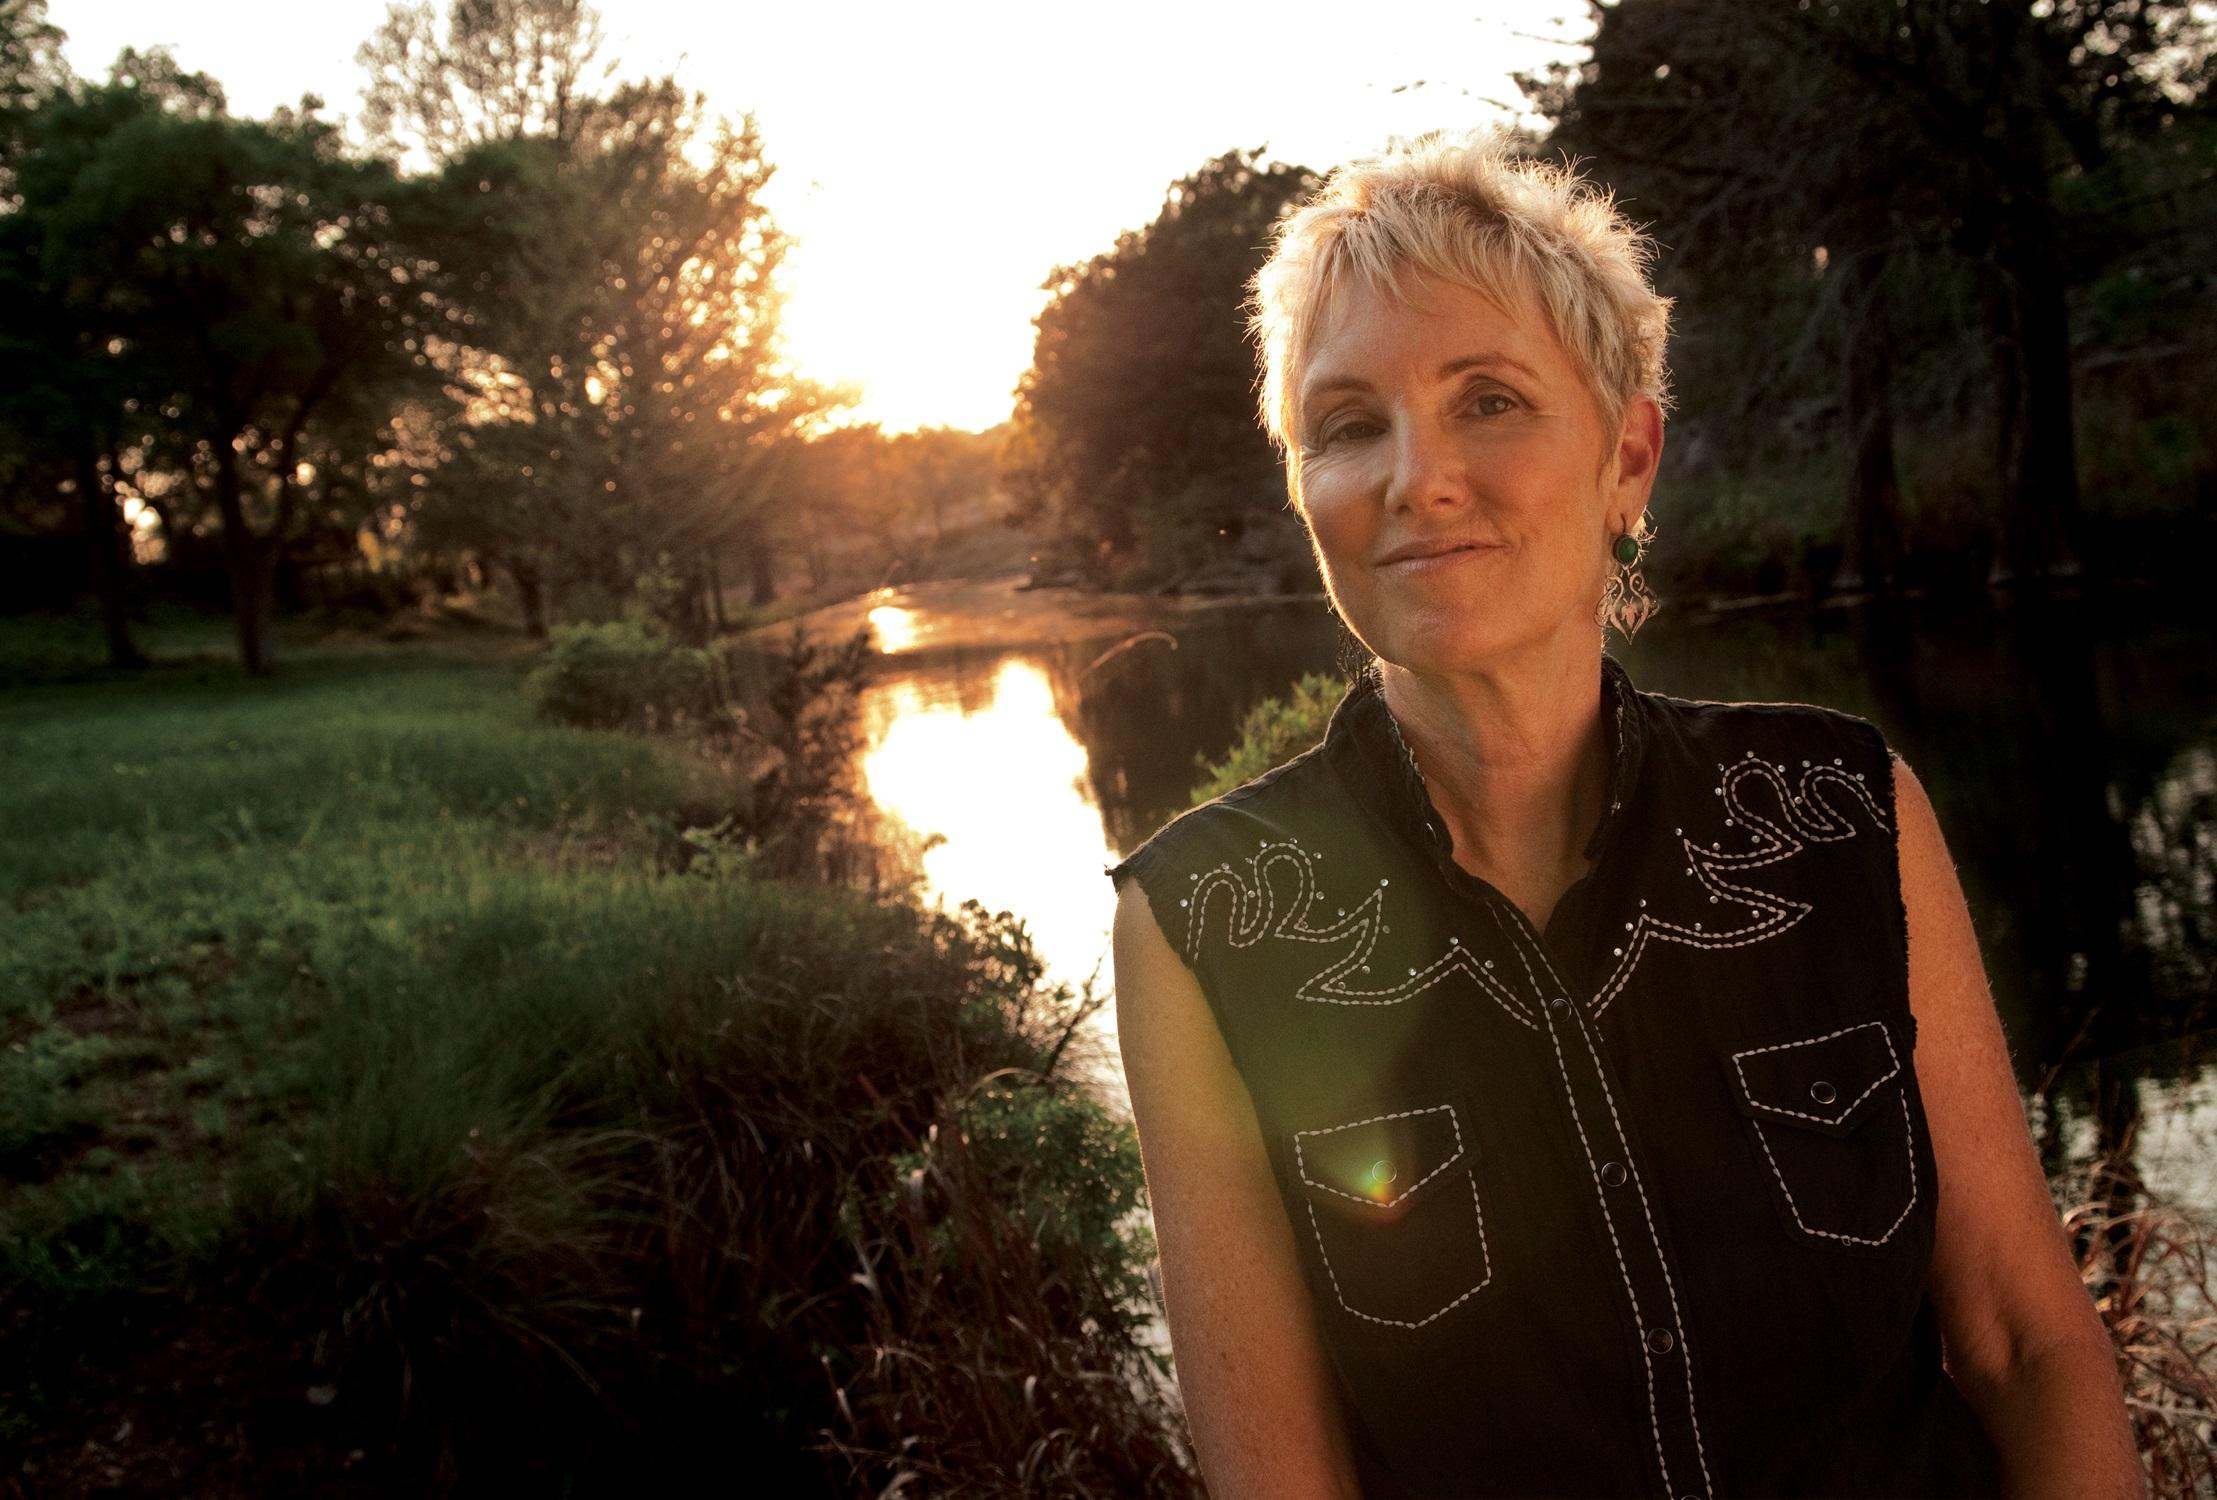 Vets Shedding the Stigma - Meredith Schofield Editorial